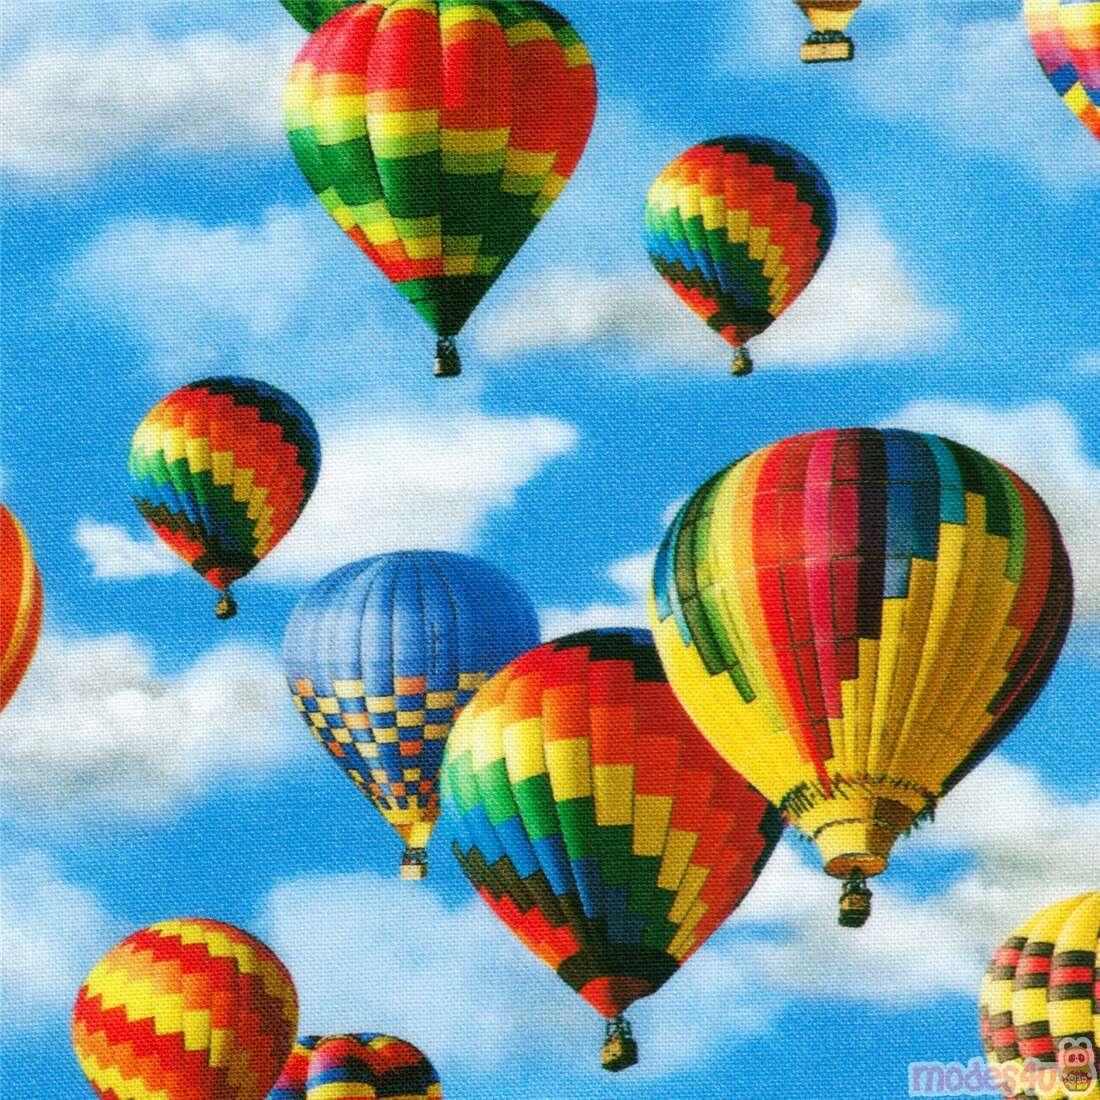 - Robert Kaufman Colorful Hot Air Balloon Fabric - ModeS4u